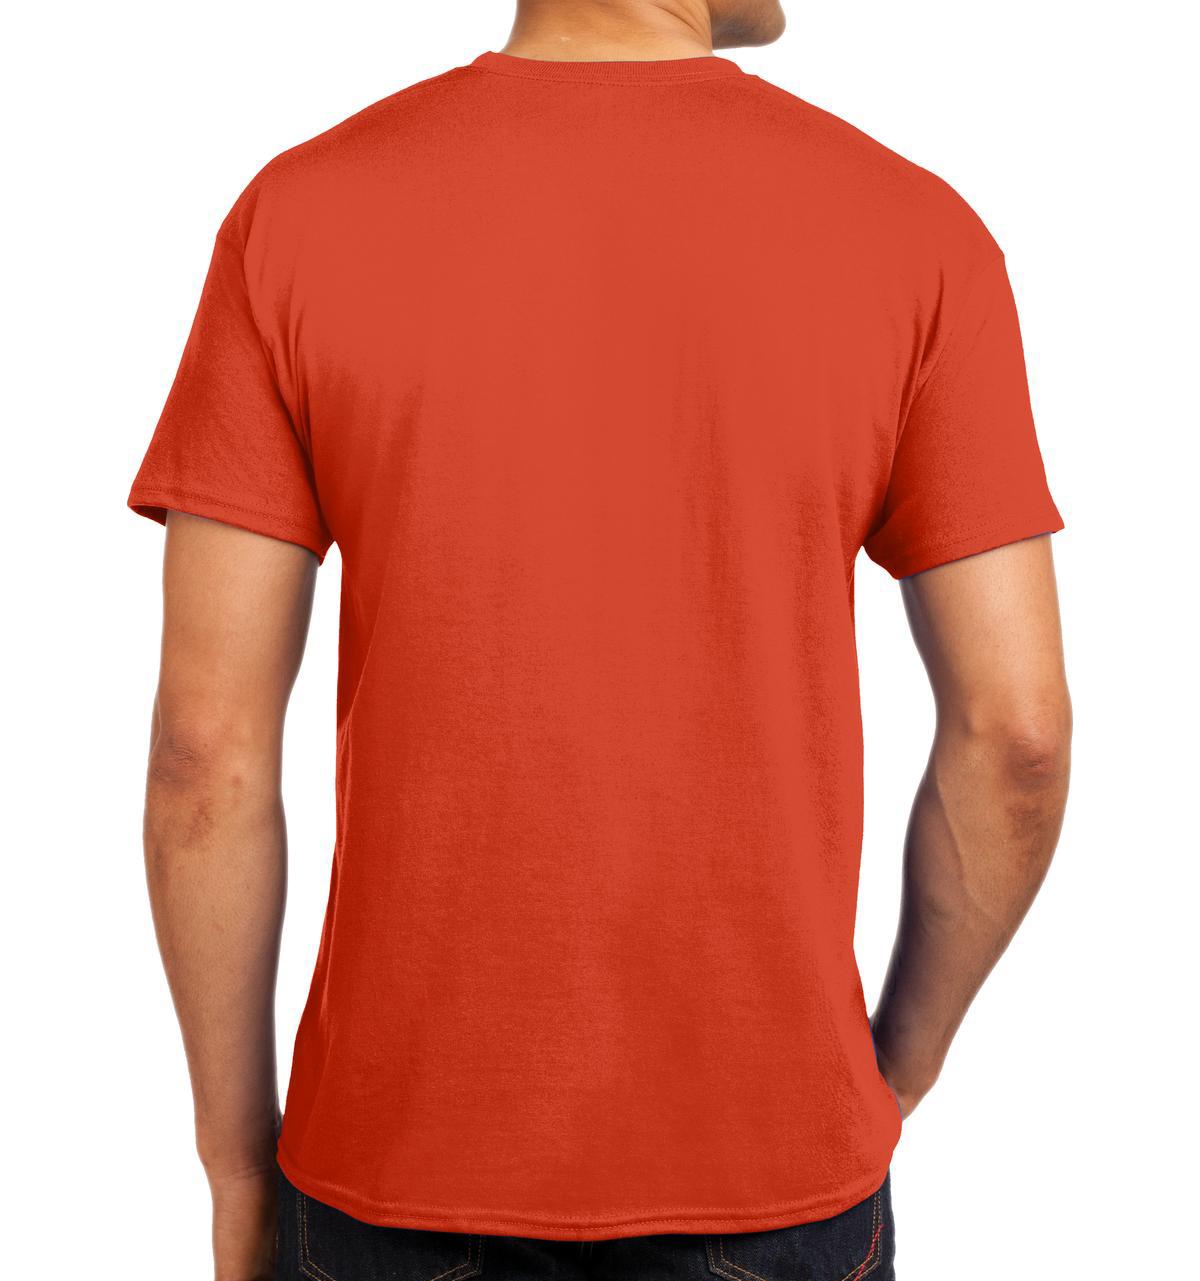 timeless design 2335b 11e77 Sf Giants Custom T Shirts